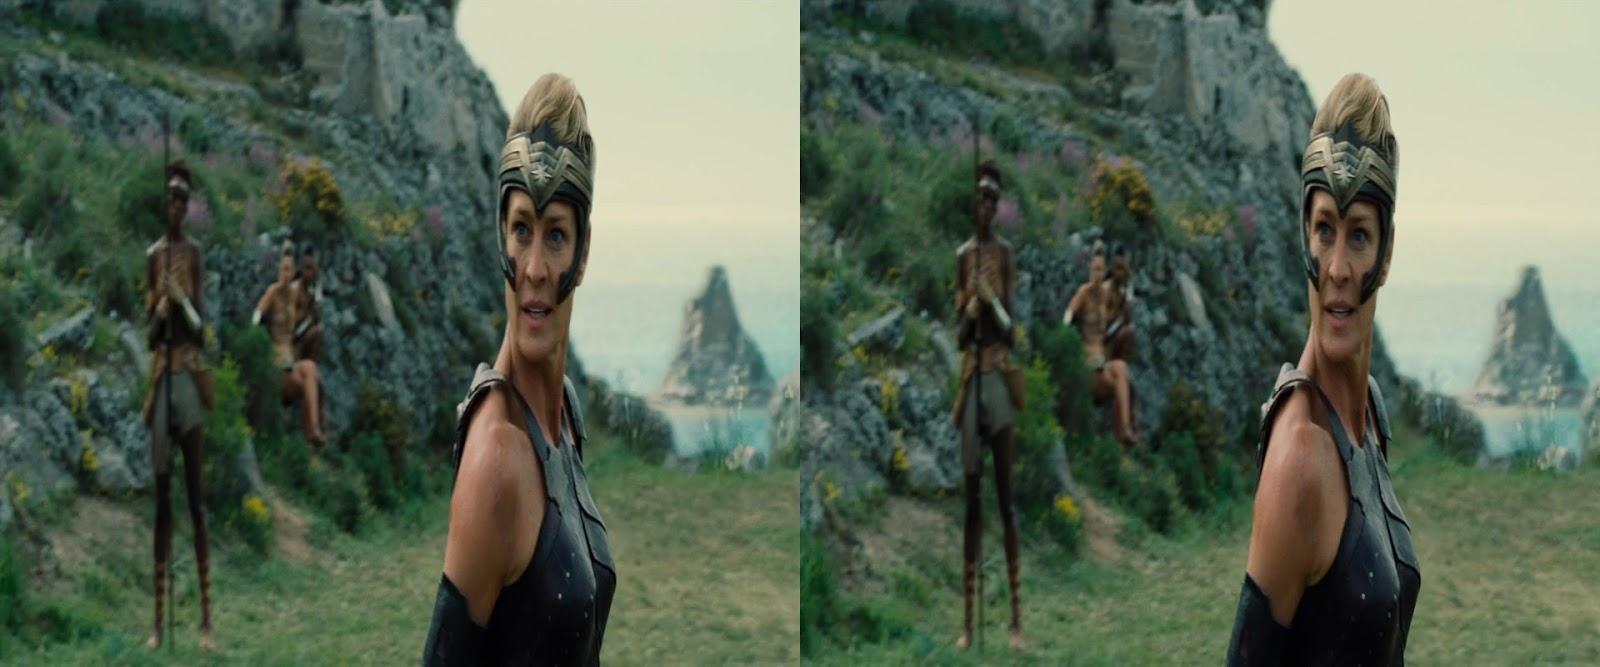 Mujer Maravilla (2017) 3D HOU Full HD 1080p Latino - Ingles captura 1